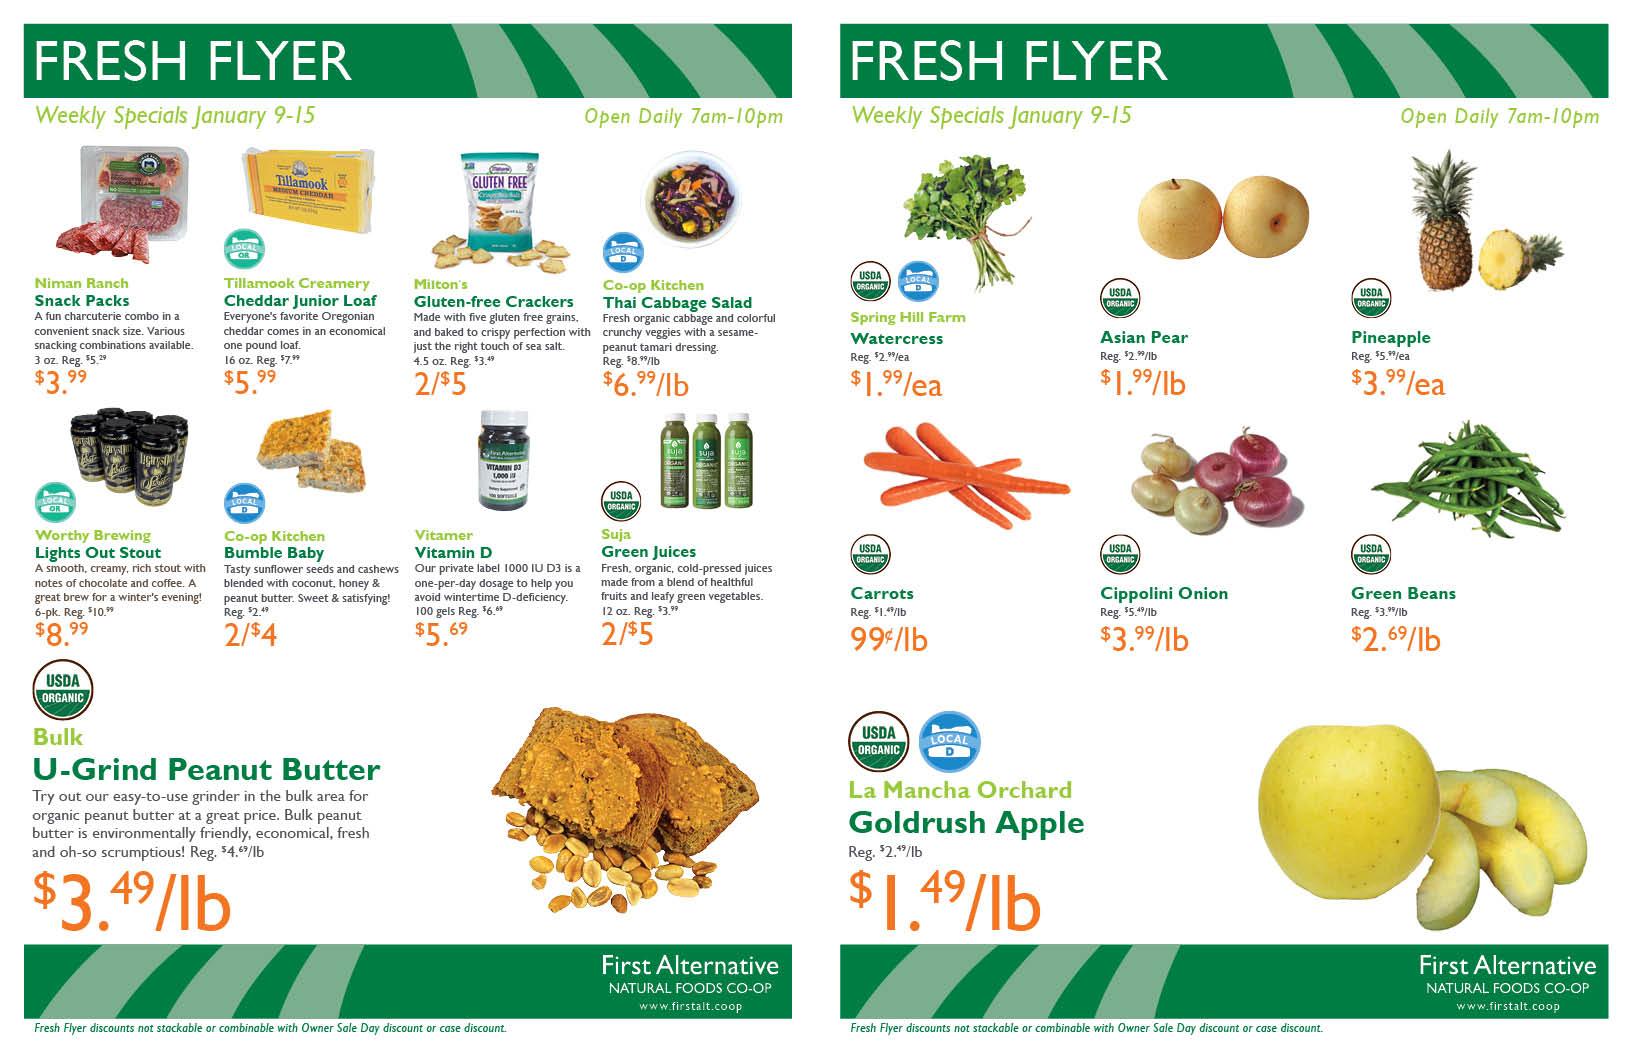 First Alternative Co-op Fresh Flyer January 9-15